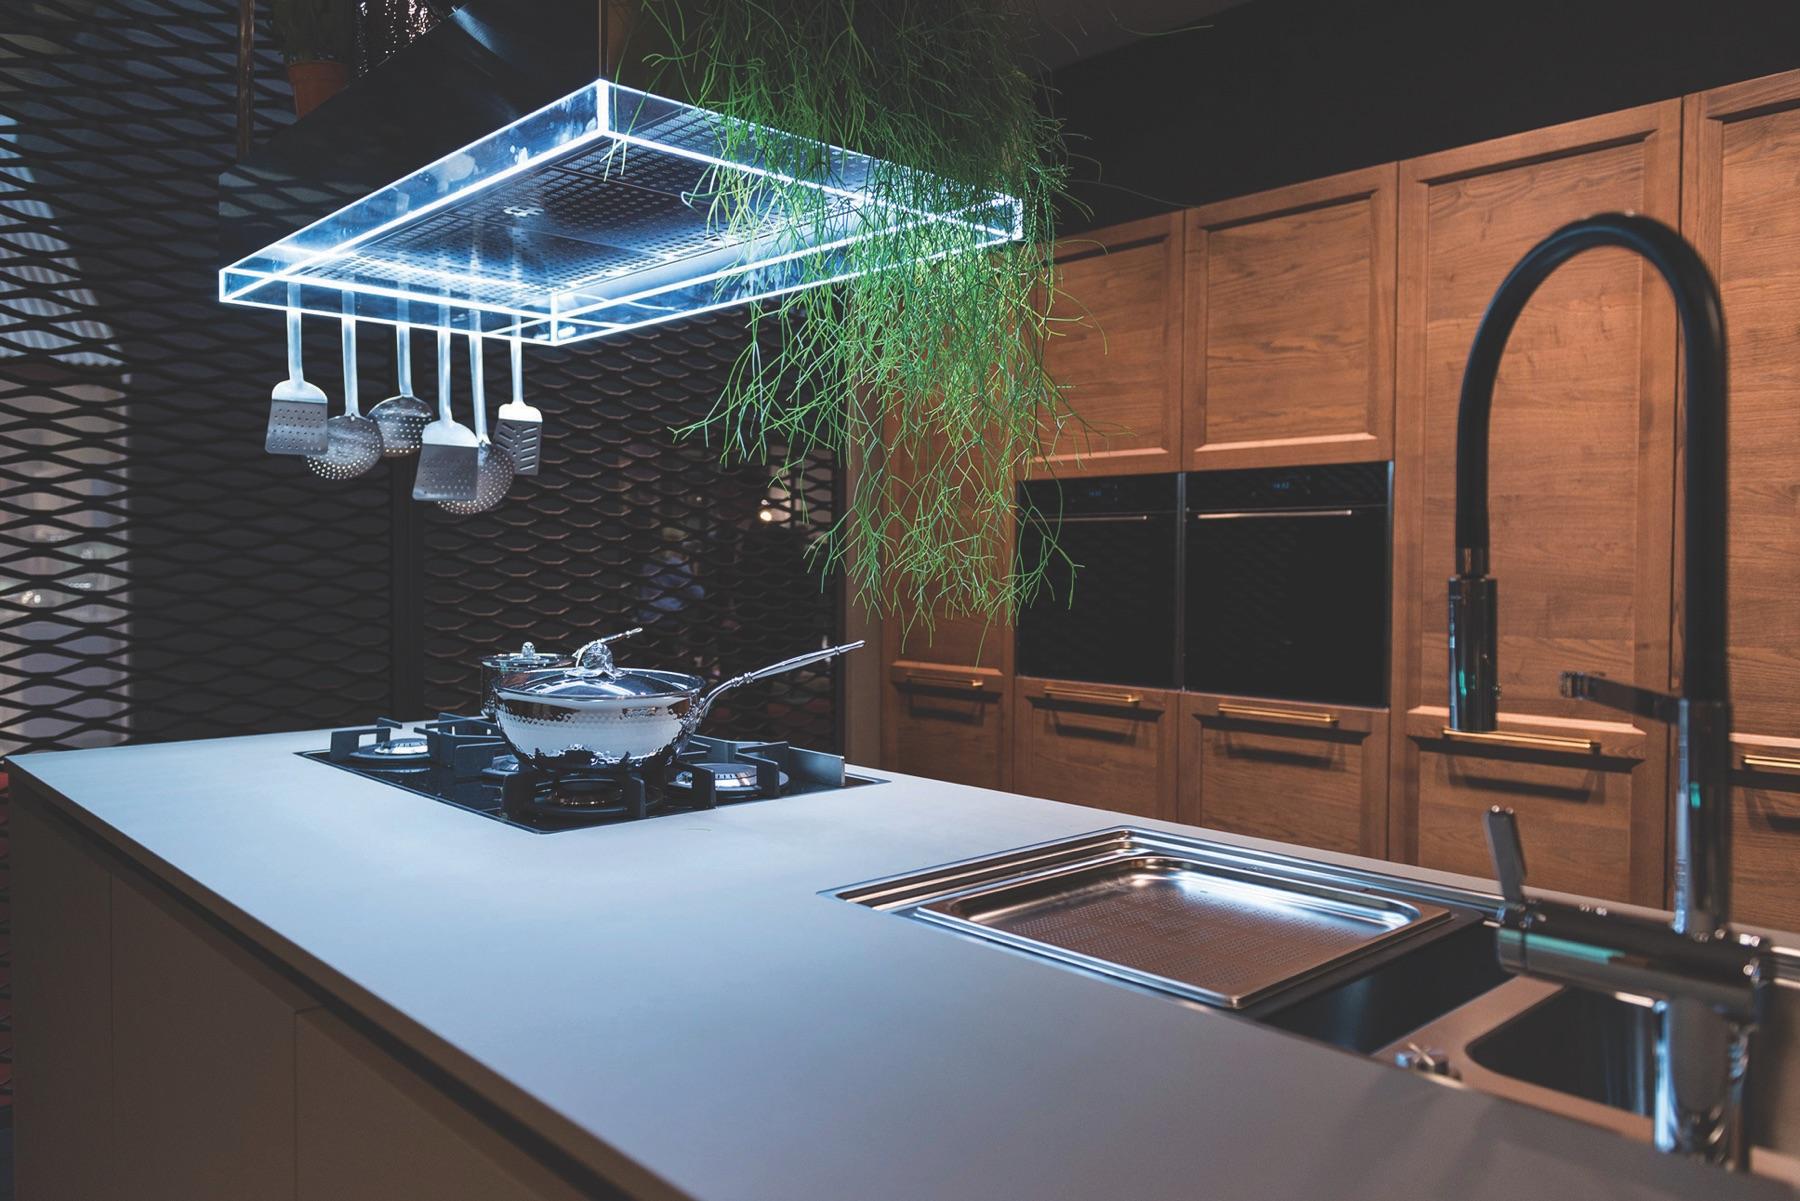 Plan-travail-design-sur-mesure-cuisine-compact-fenix-grigio-londra-STC-Paris